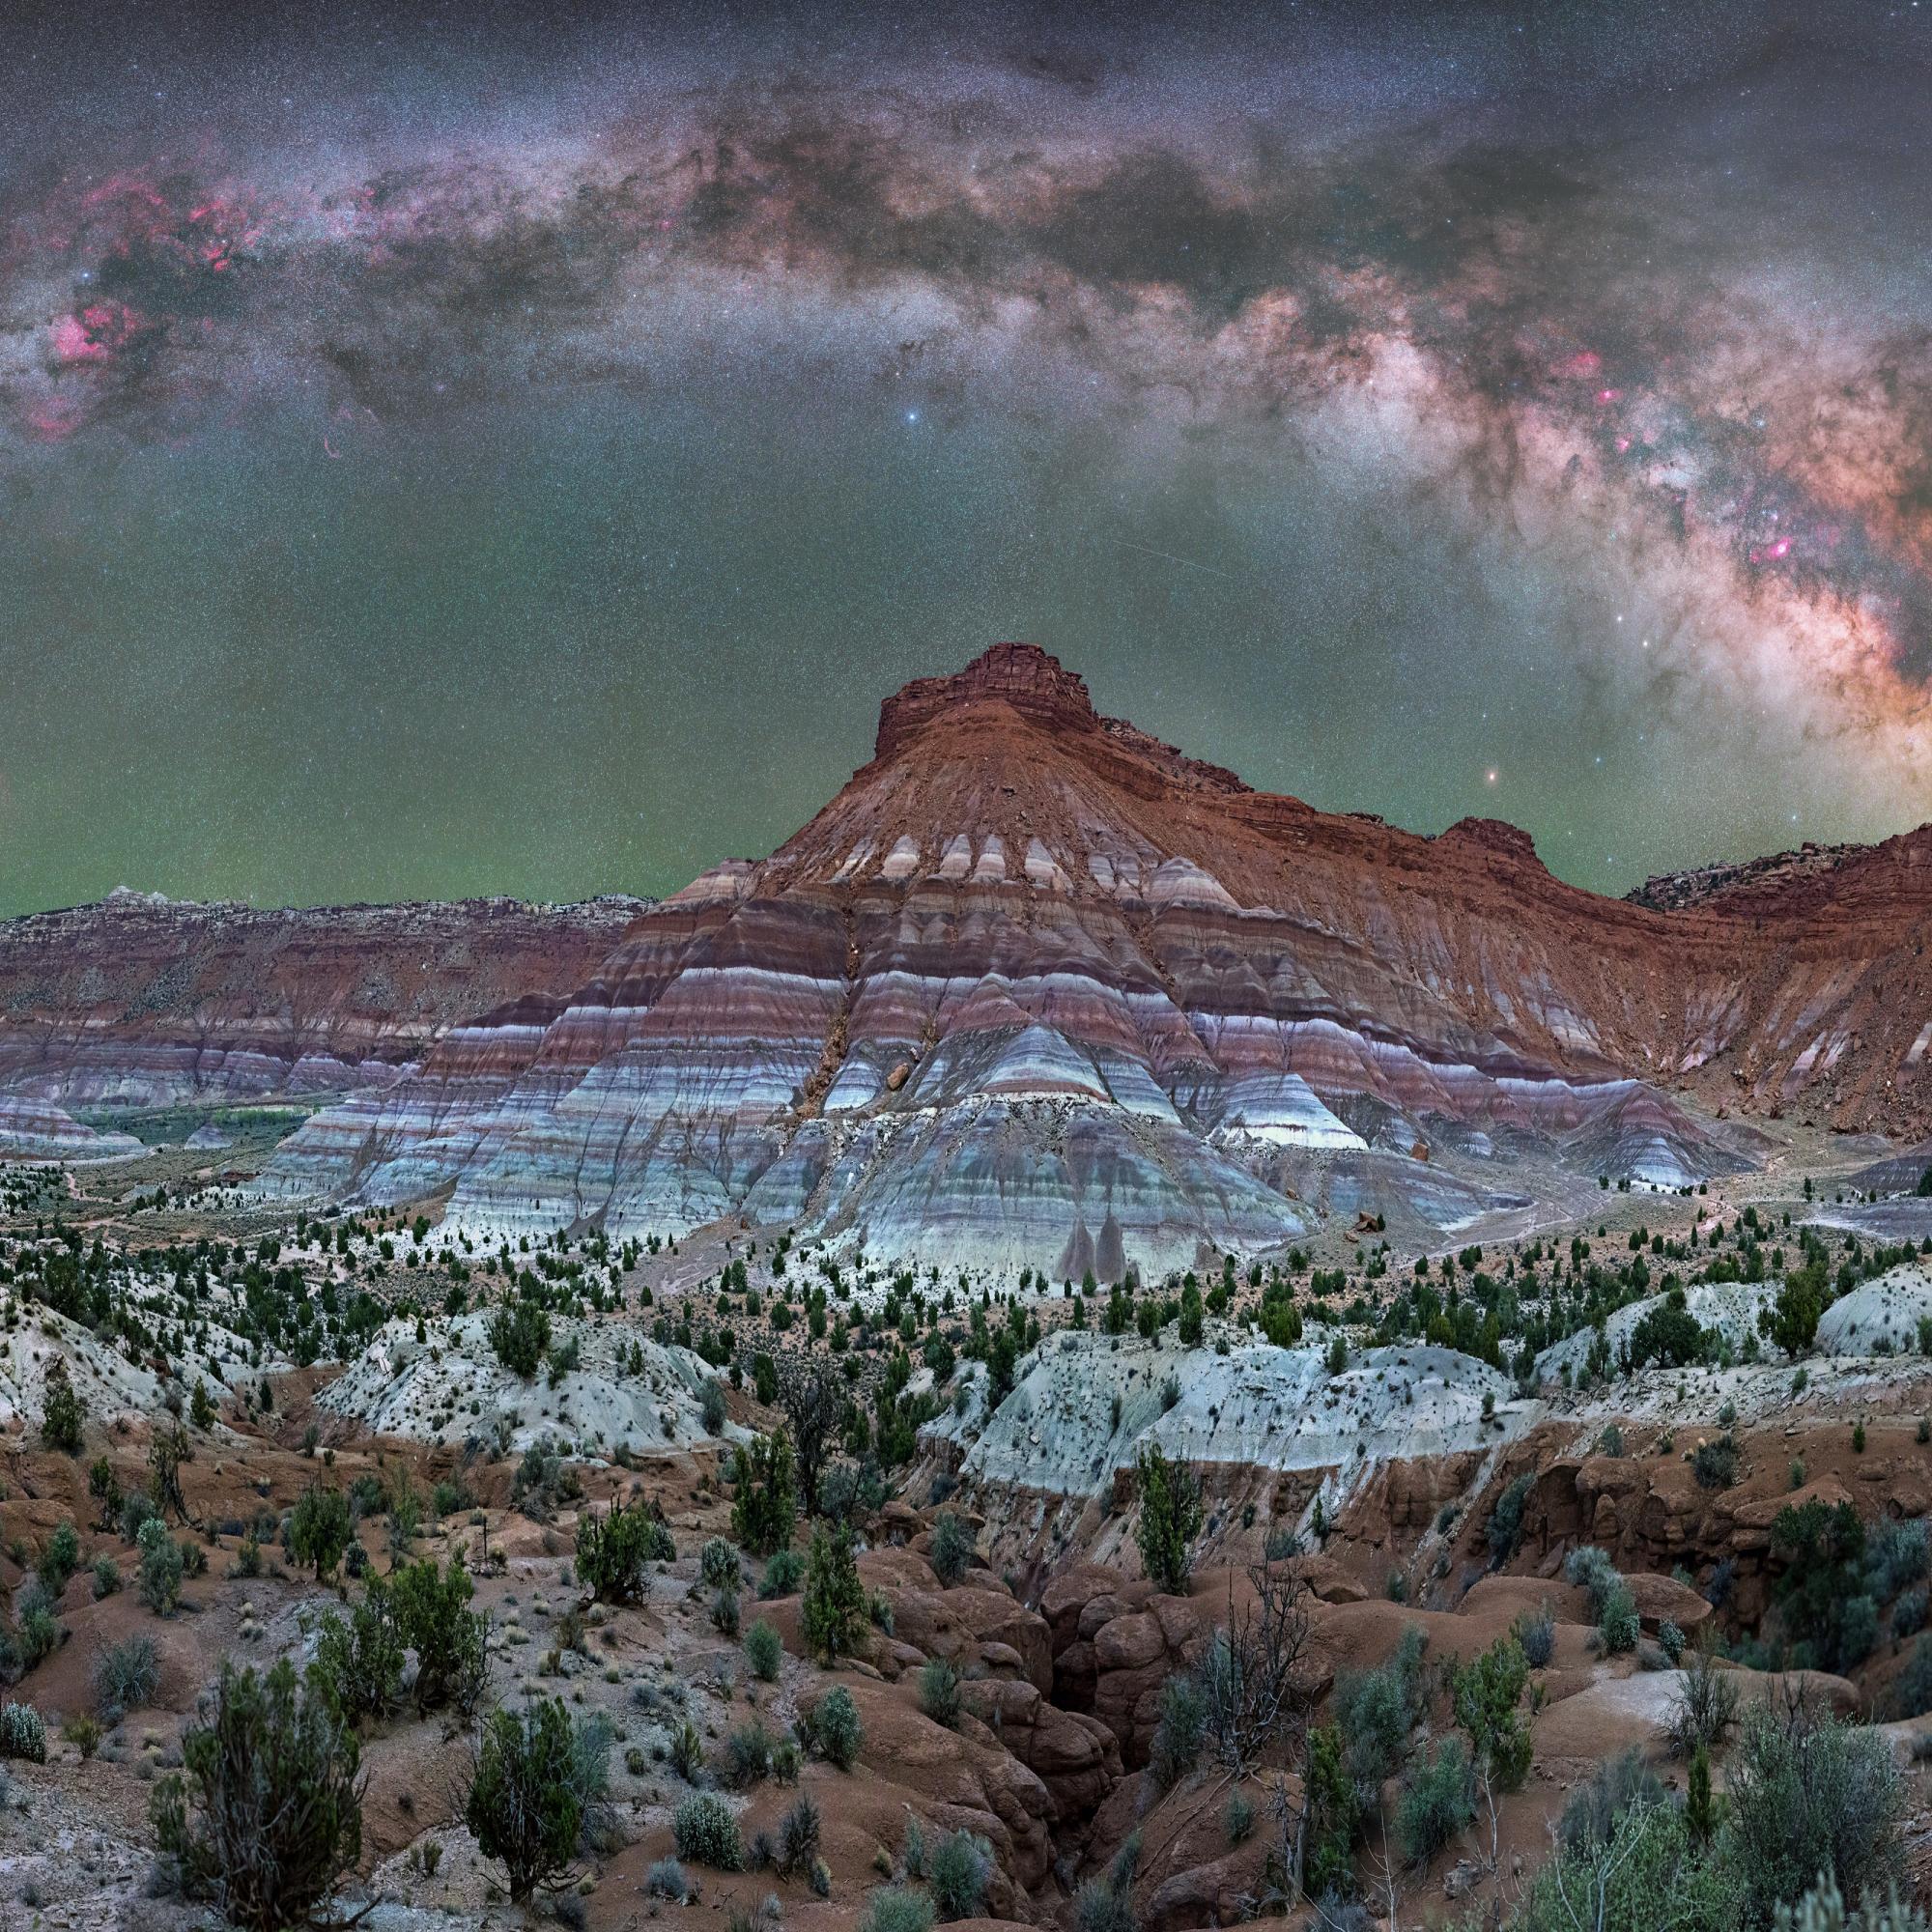 Paria Utah under the Milky Way